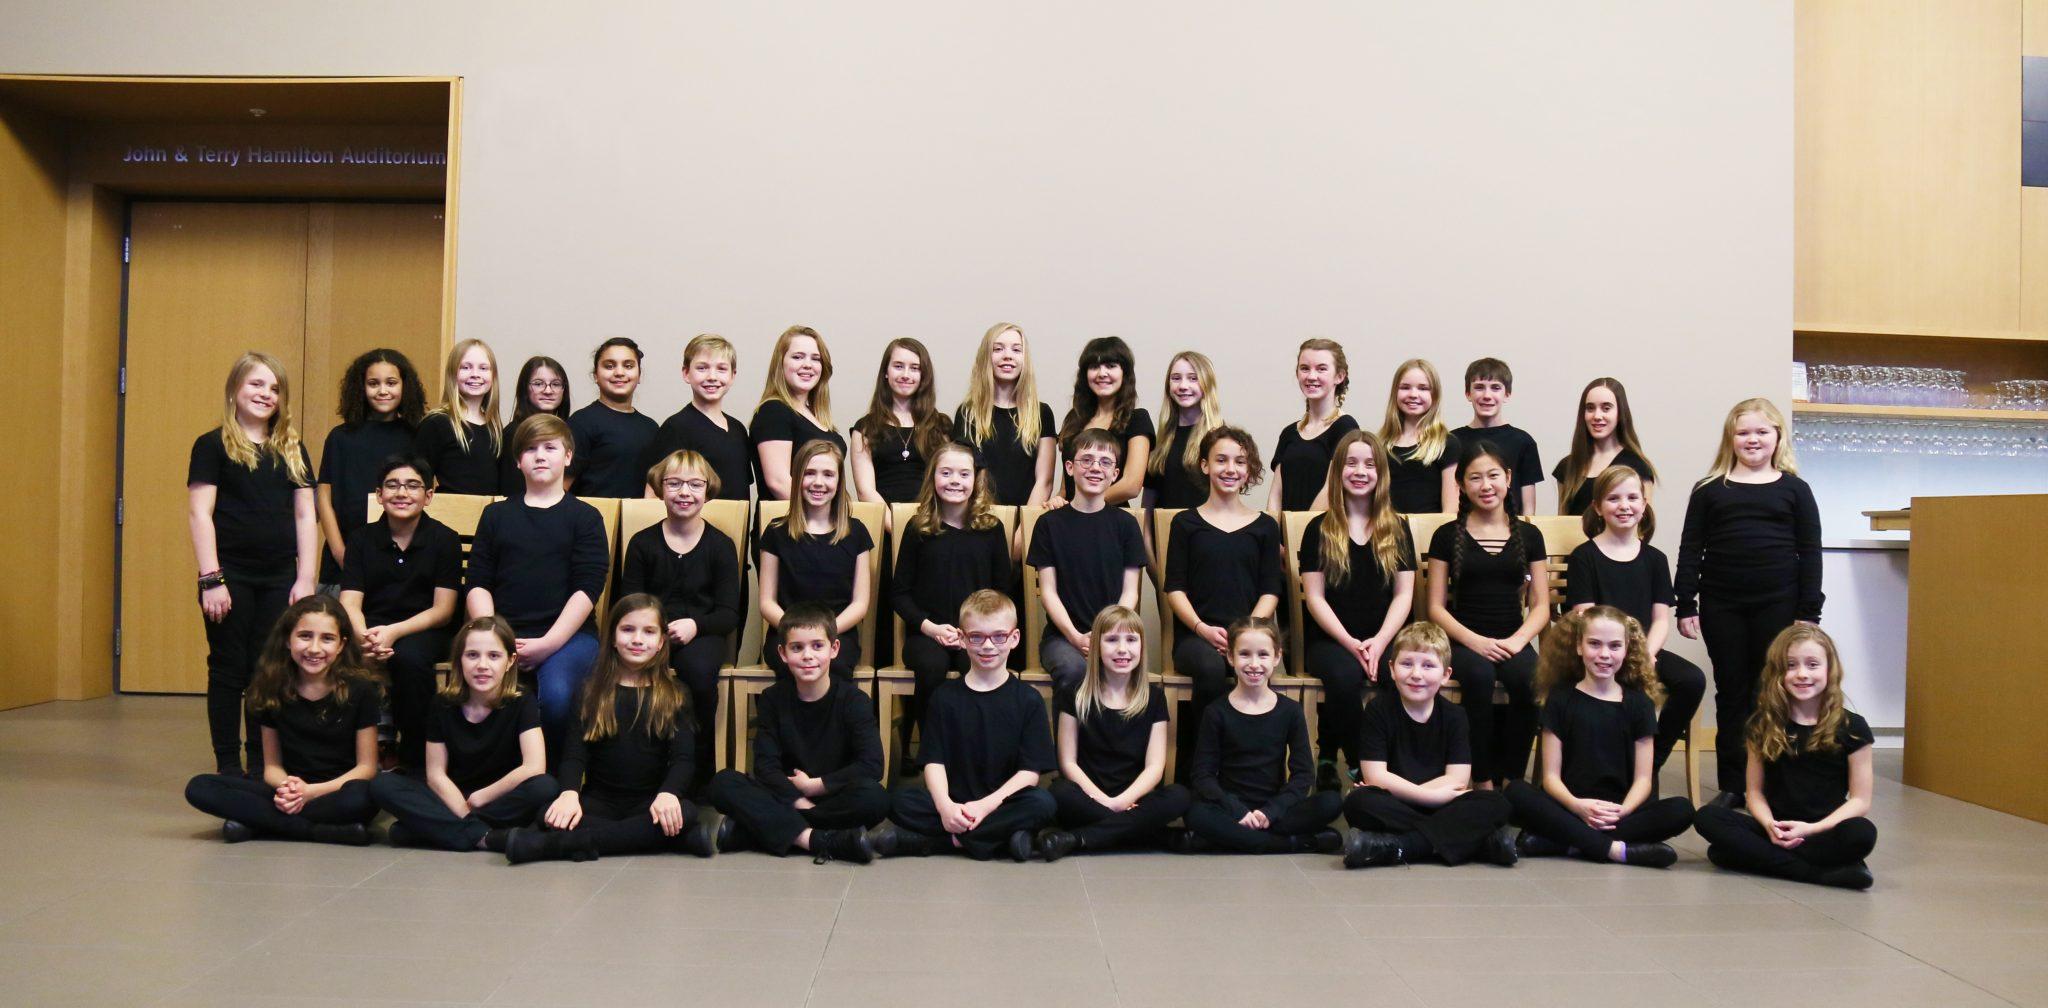 Children's Chorus announced for Technicolor musical at Dunfield Theatre Cambridge